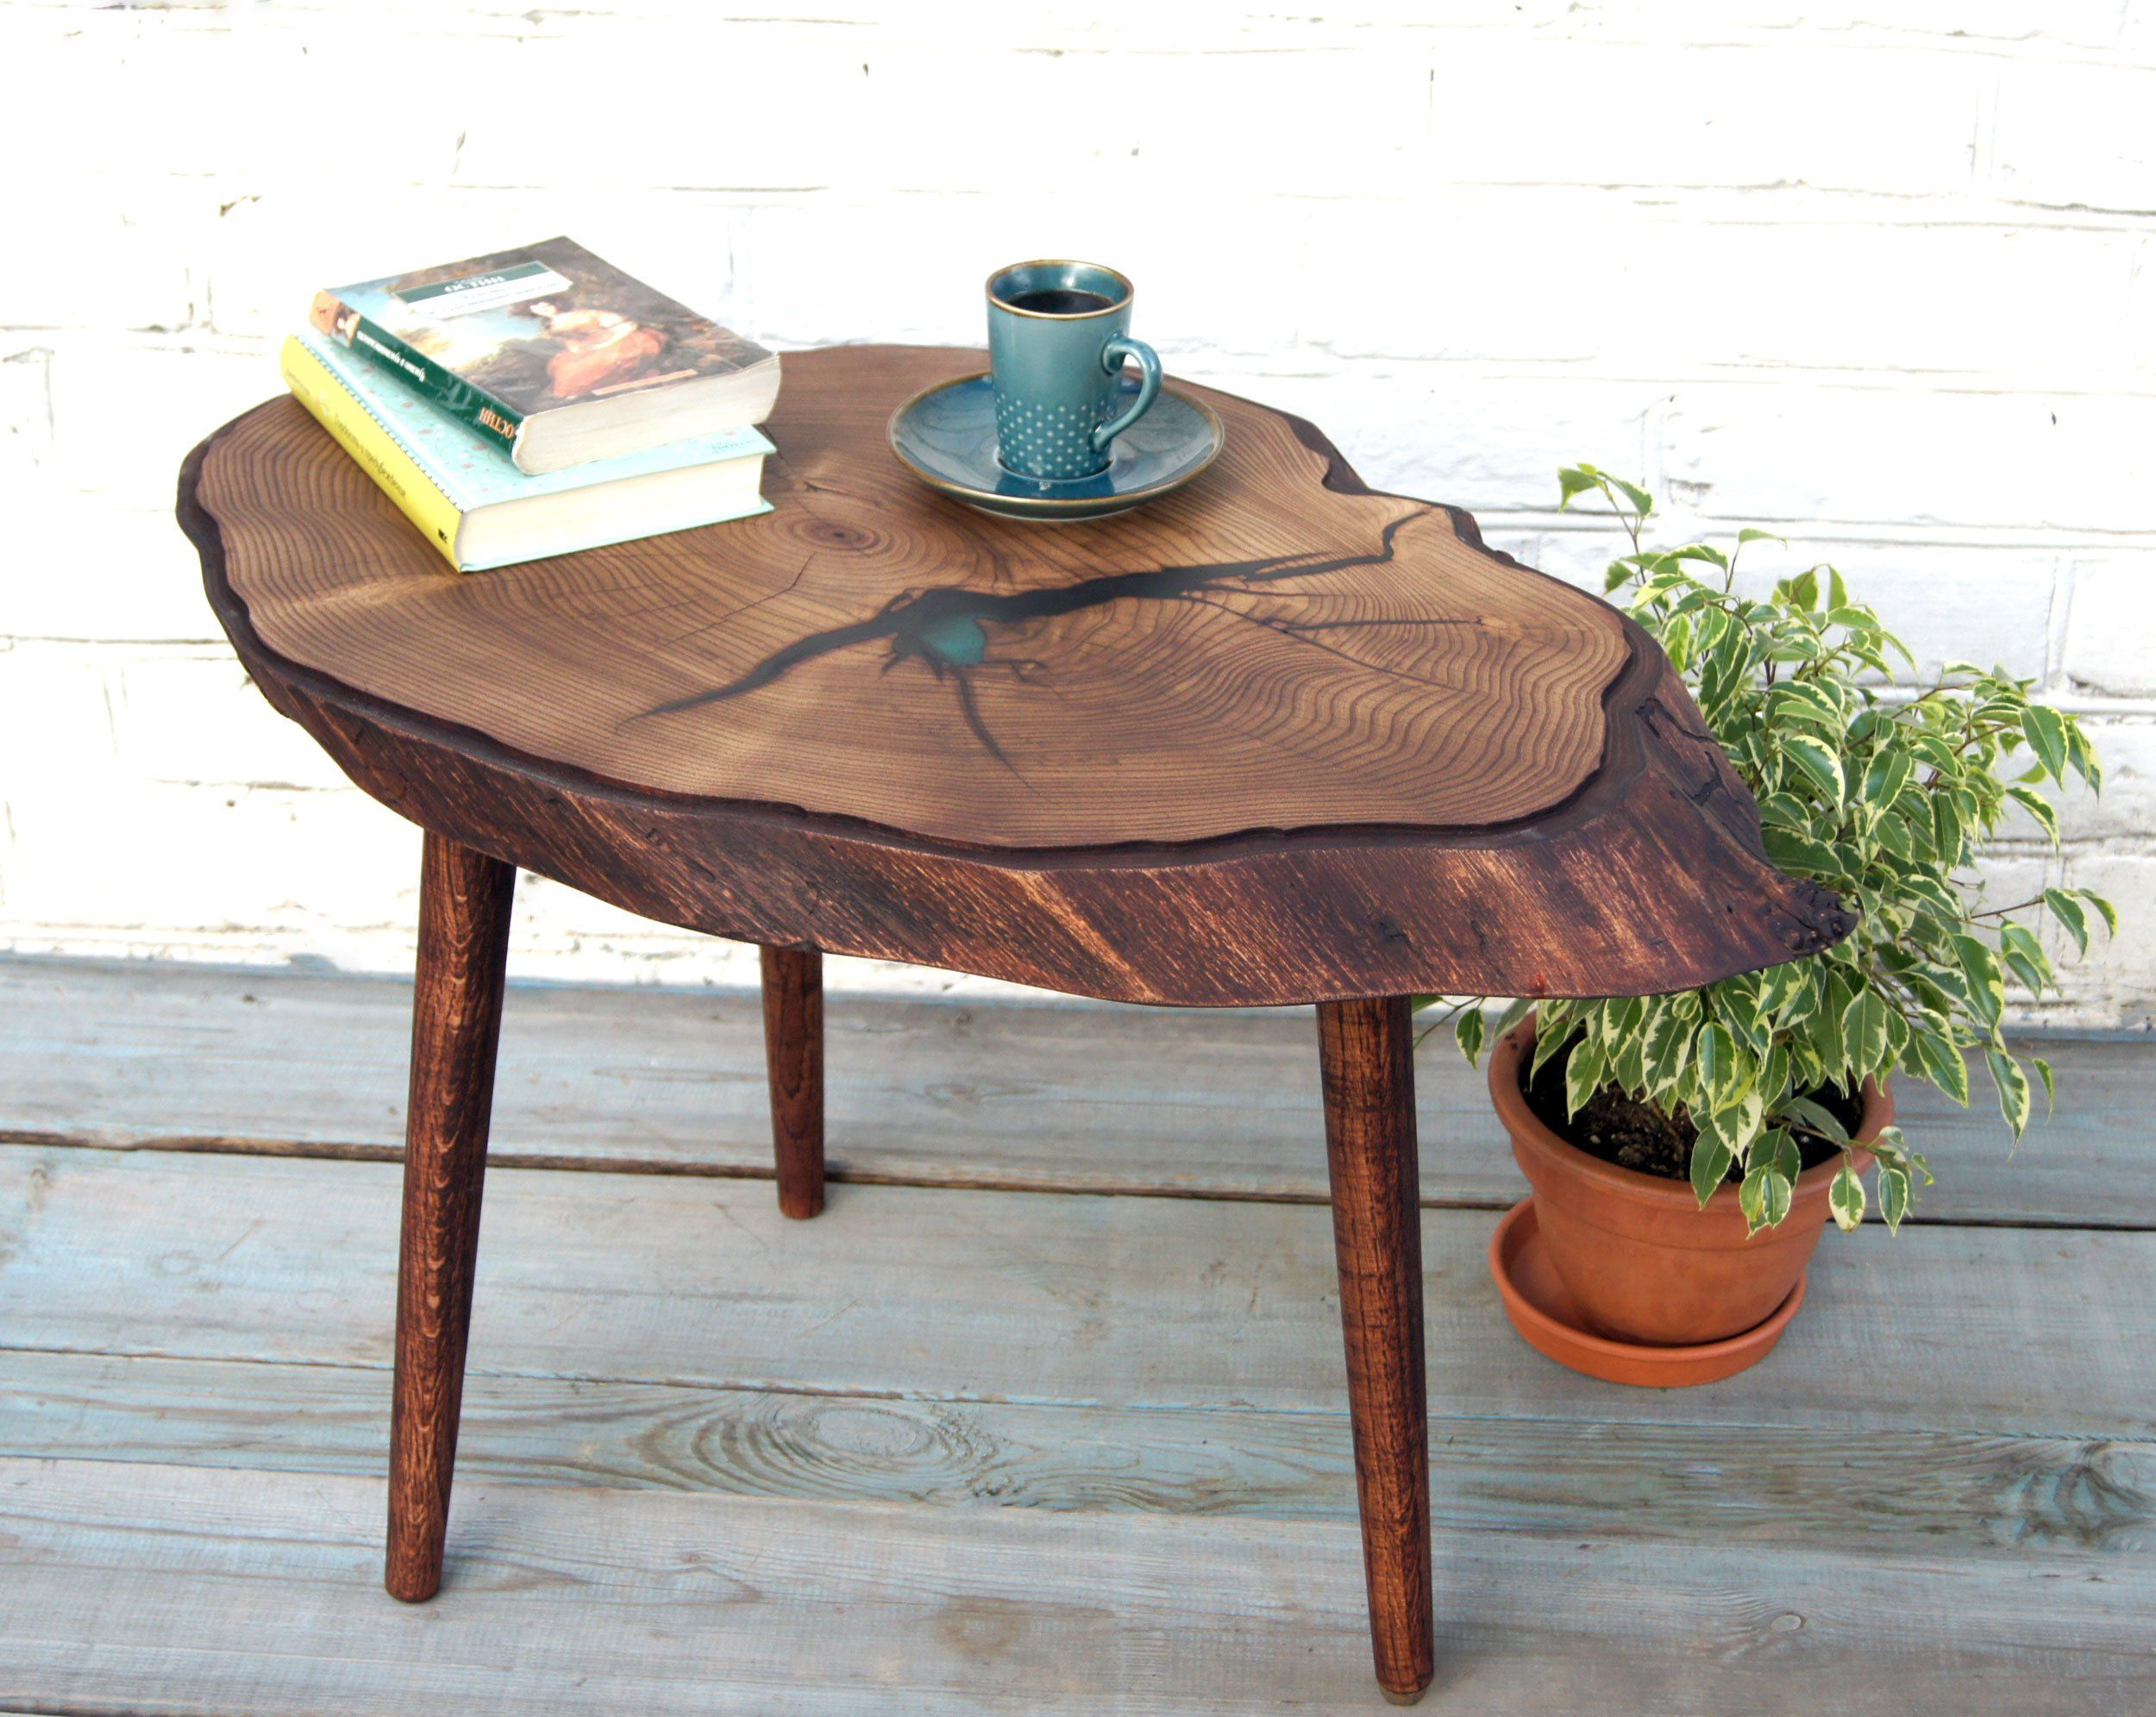 Large Epoxy Resin Coffee Table Live Edge Wood Slab Table Etsy Wood Slab Table Wood Table Rustic Live Edge Wood Table [ 1991 x 2500 Pixel ]